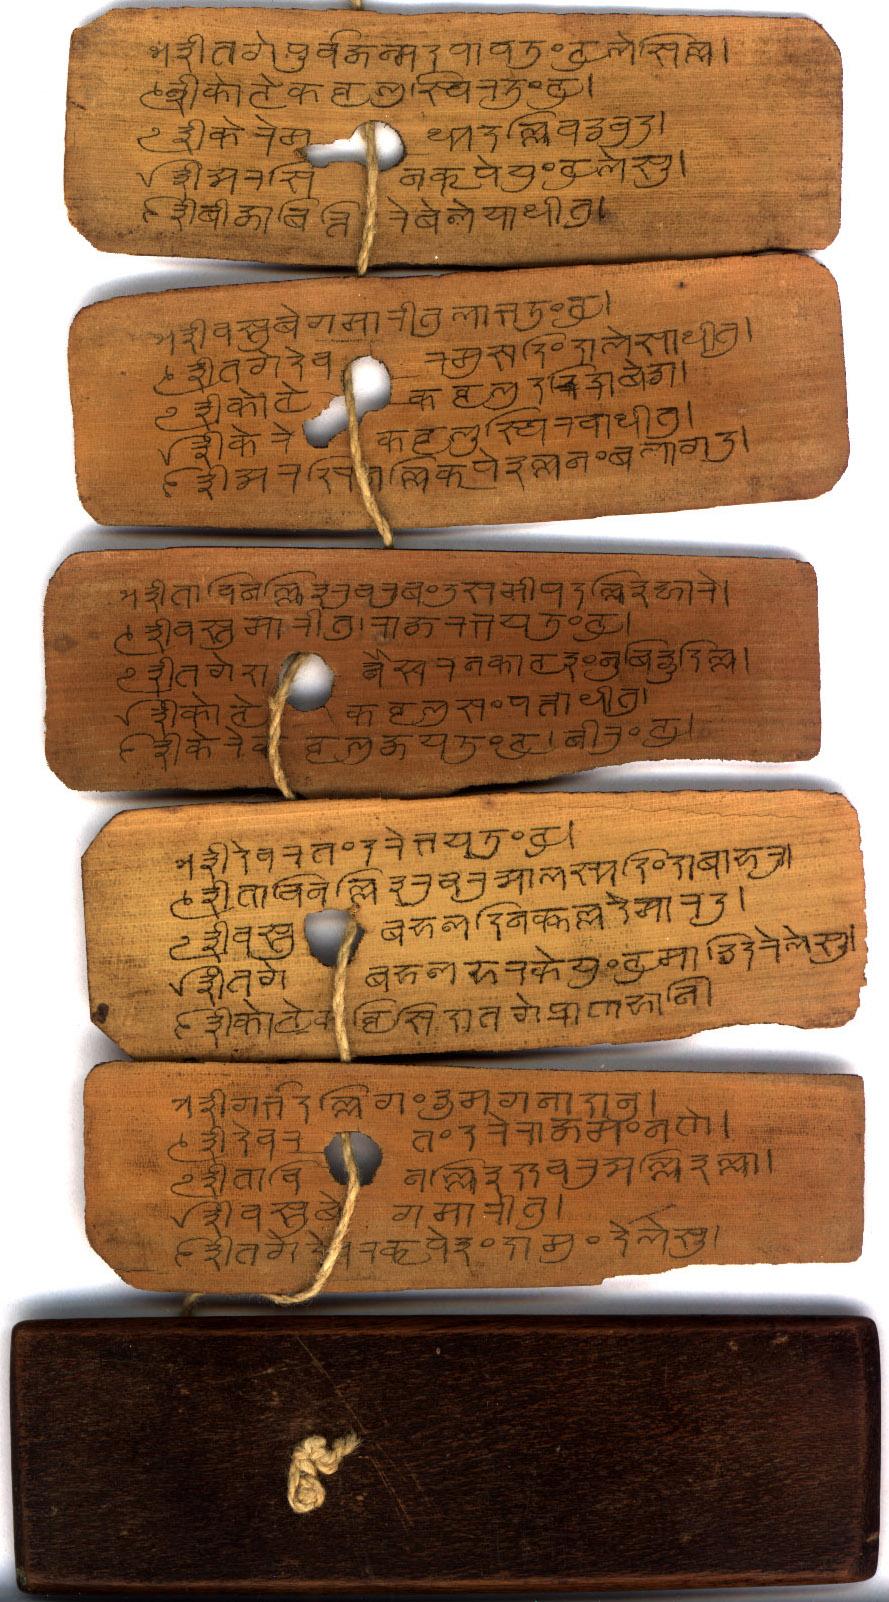 An Indic Palm Leaf Manuscript Please Help Identify It